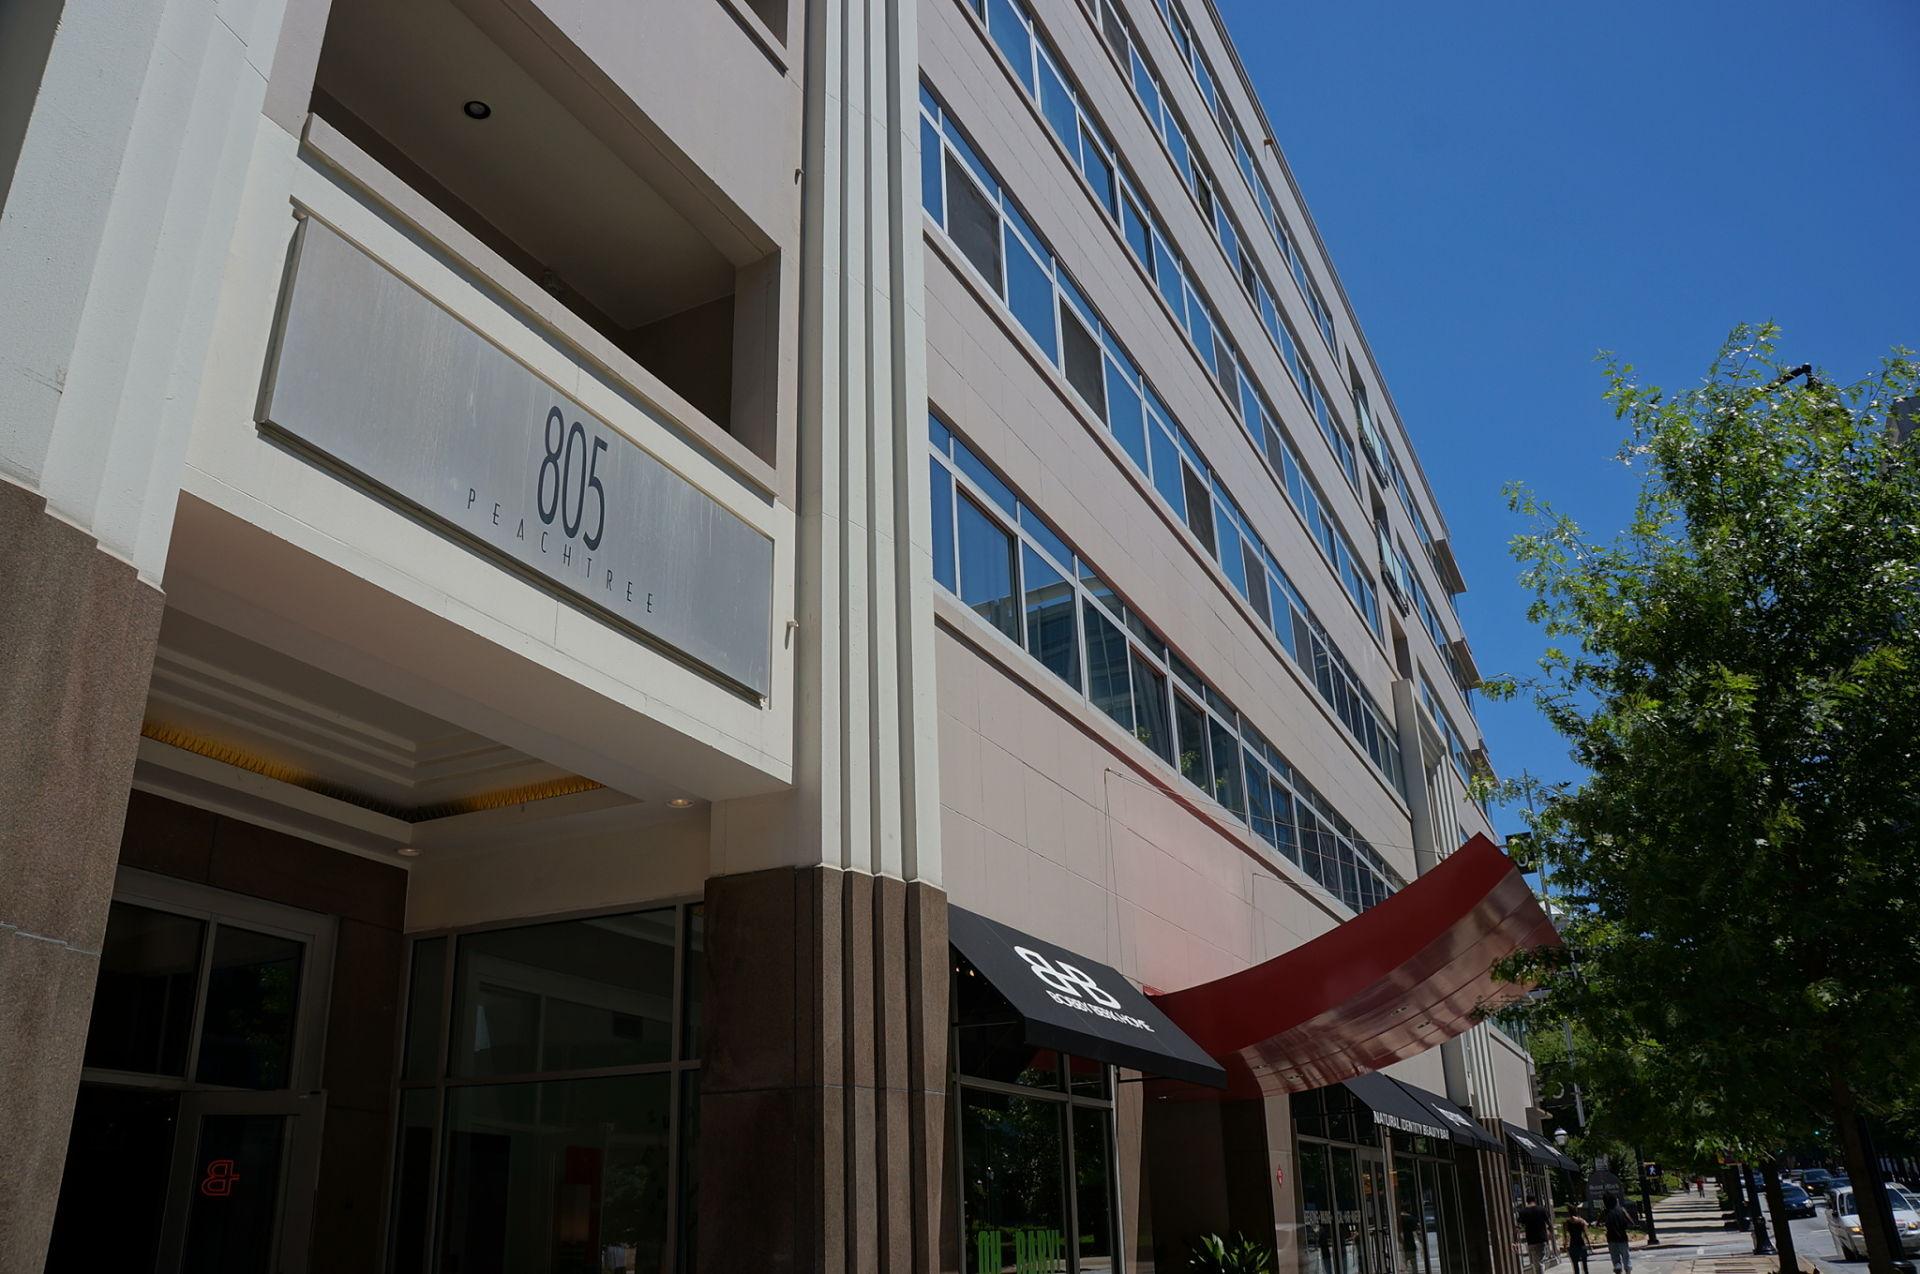 805 Peachtree Lofts